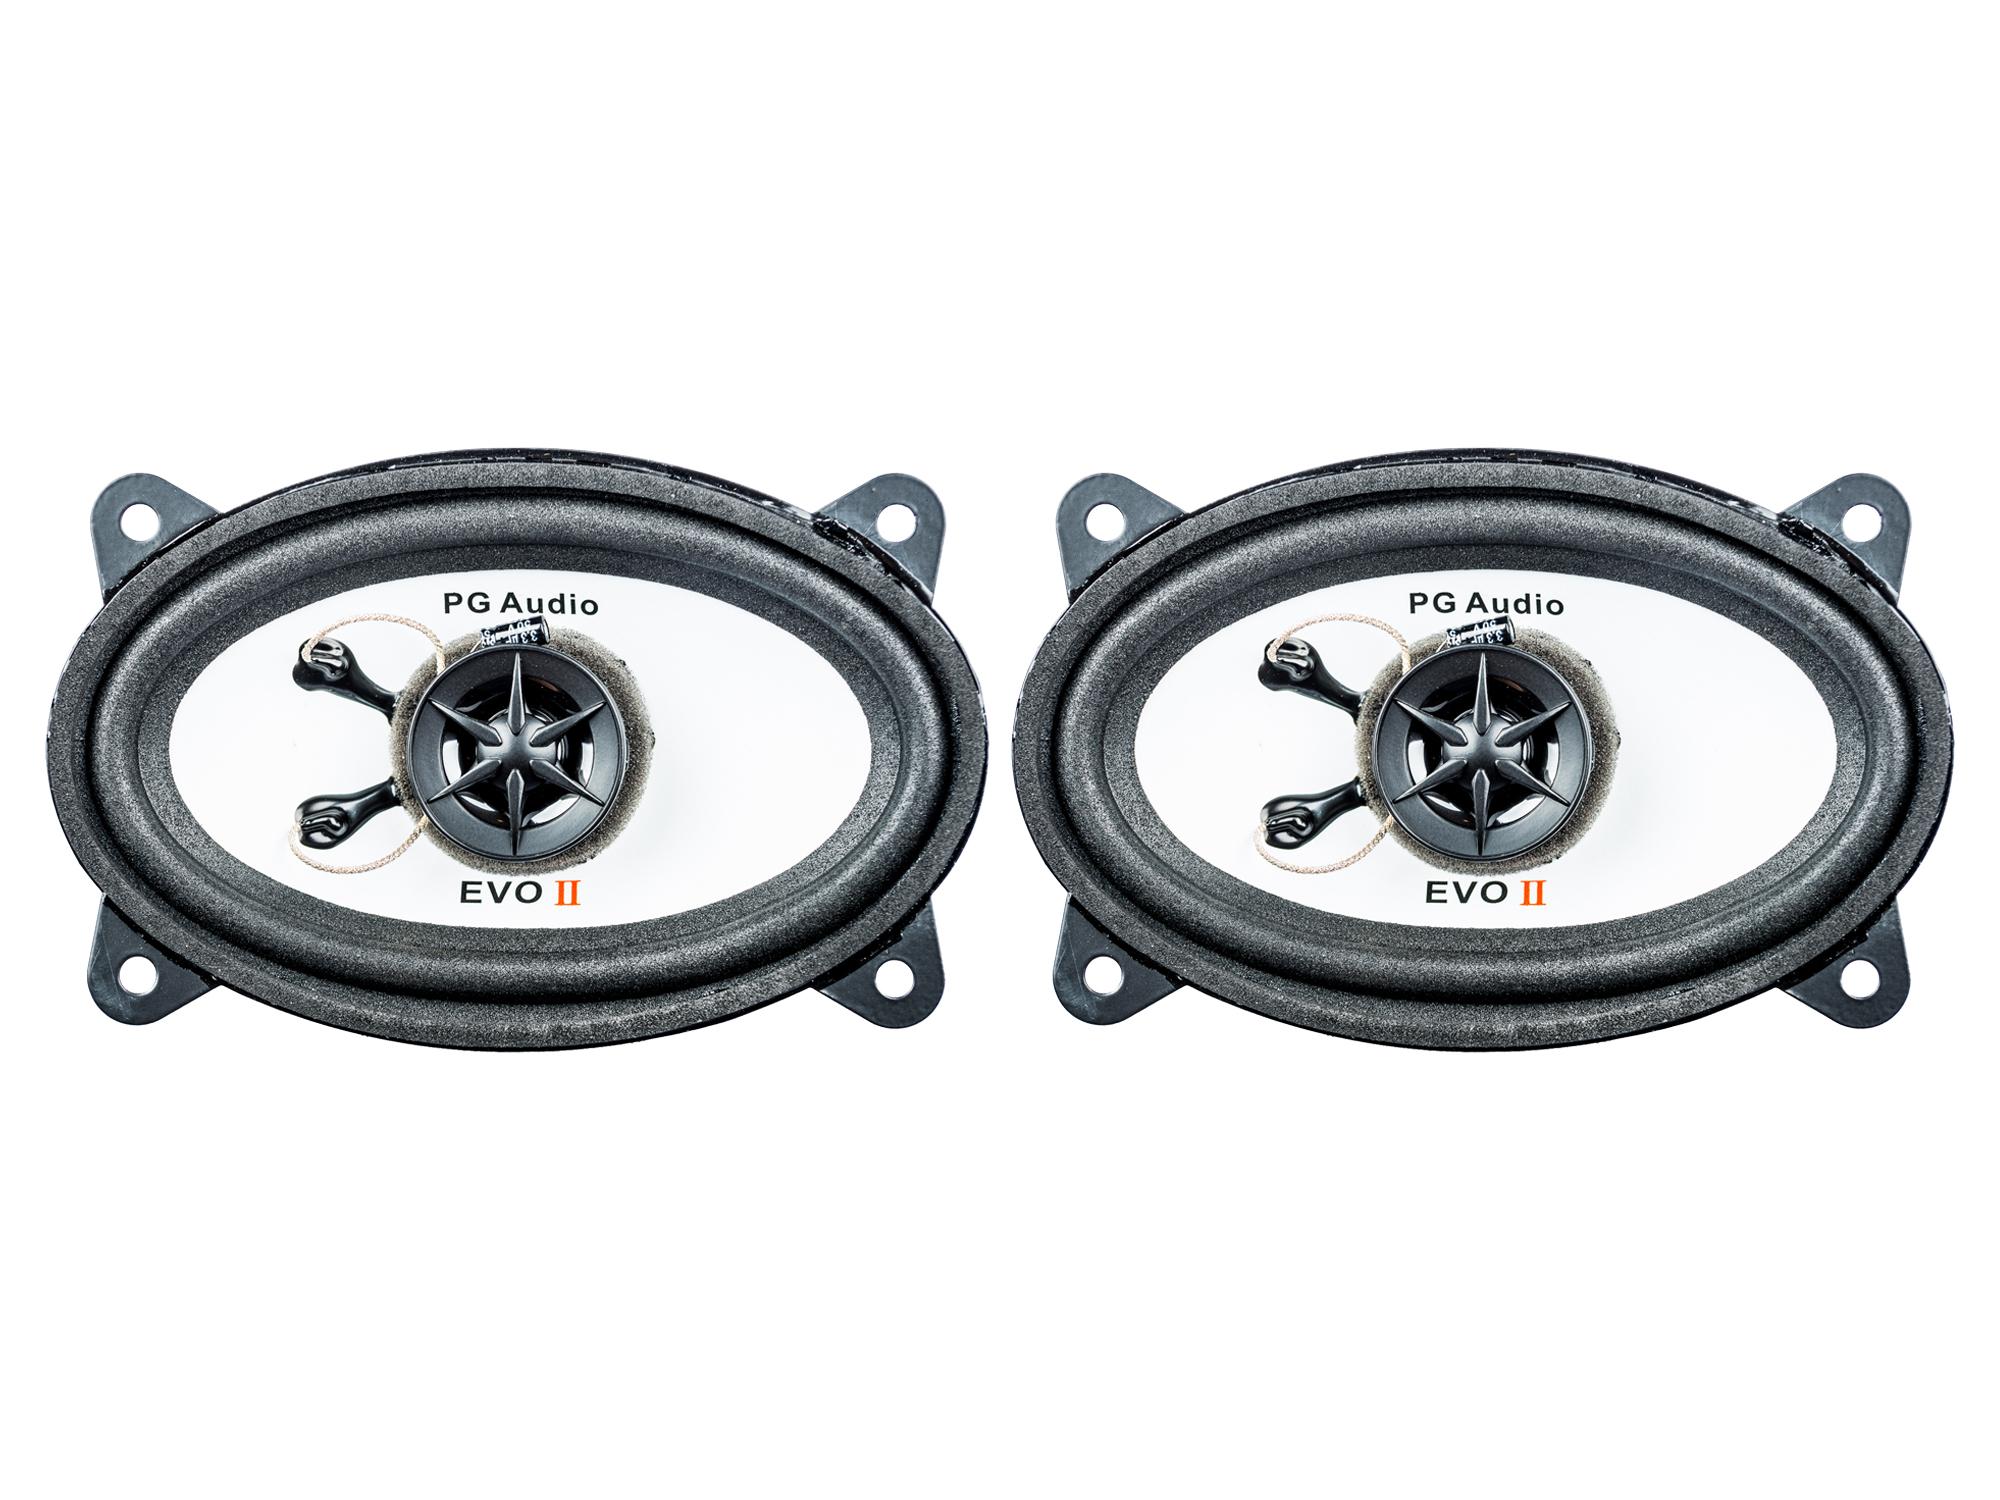 Lautsprecher 4x6 Zoll BMW 3er,5er,7er, Chevrolet Aveo,Kalos und K-Serie – Bild 1